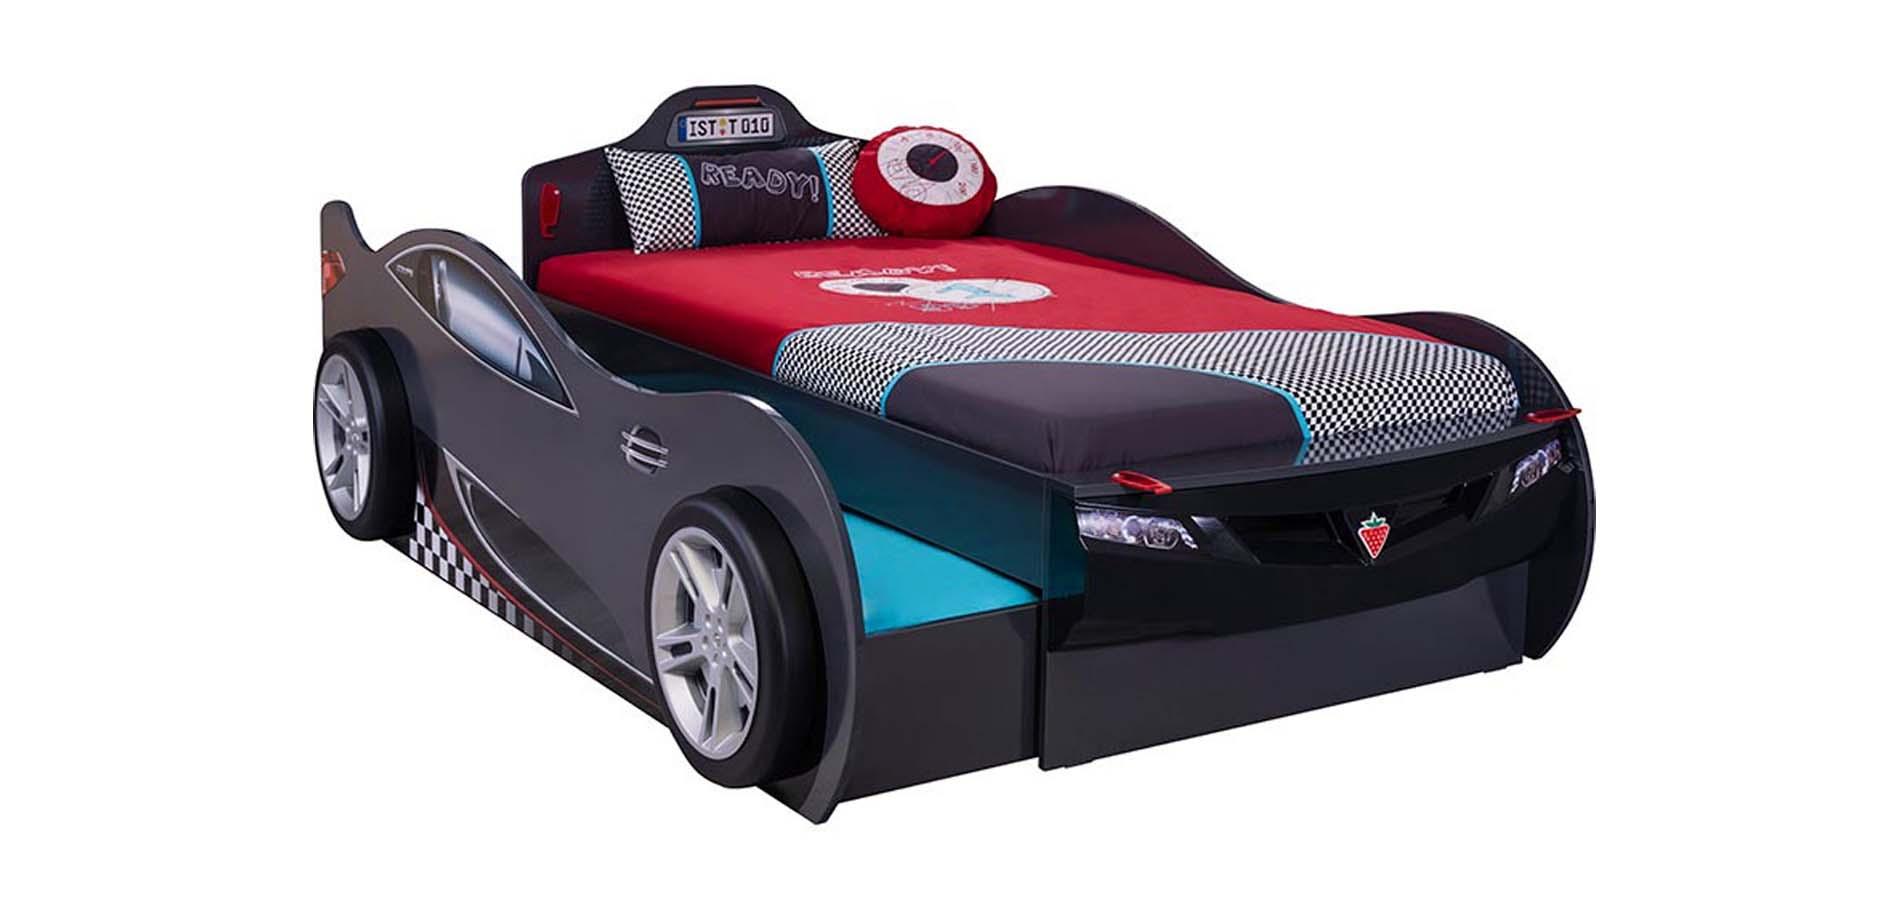 Kids Car Bed Gt 1313 Epiplo Fwtistiko Mixalopoylos